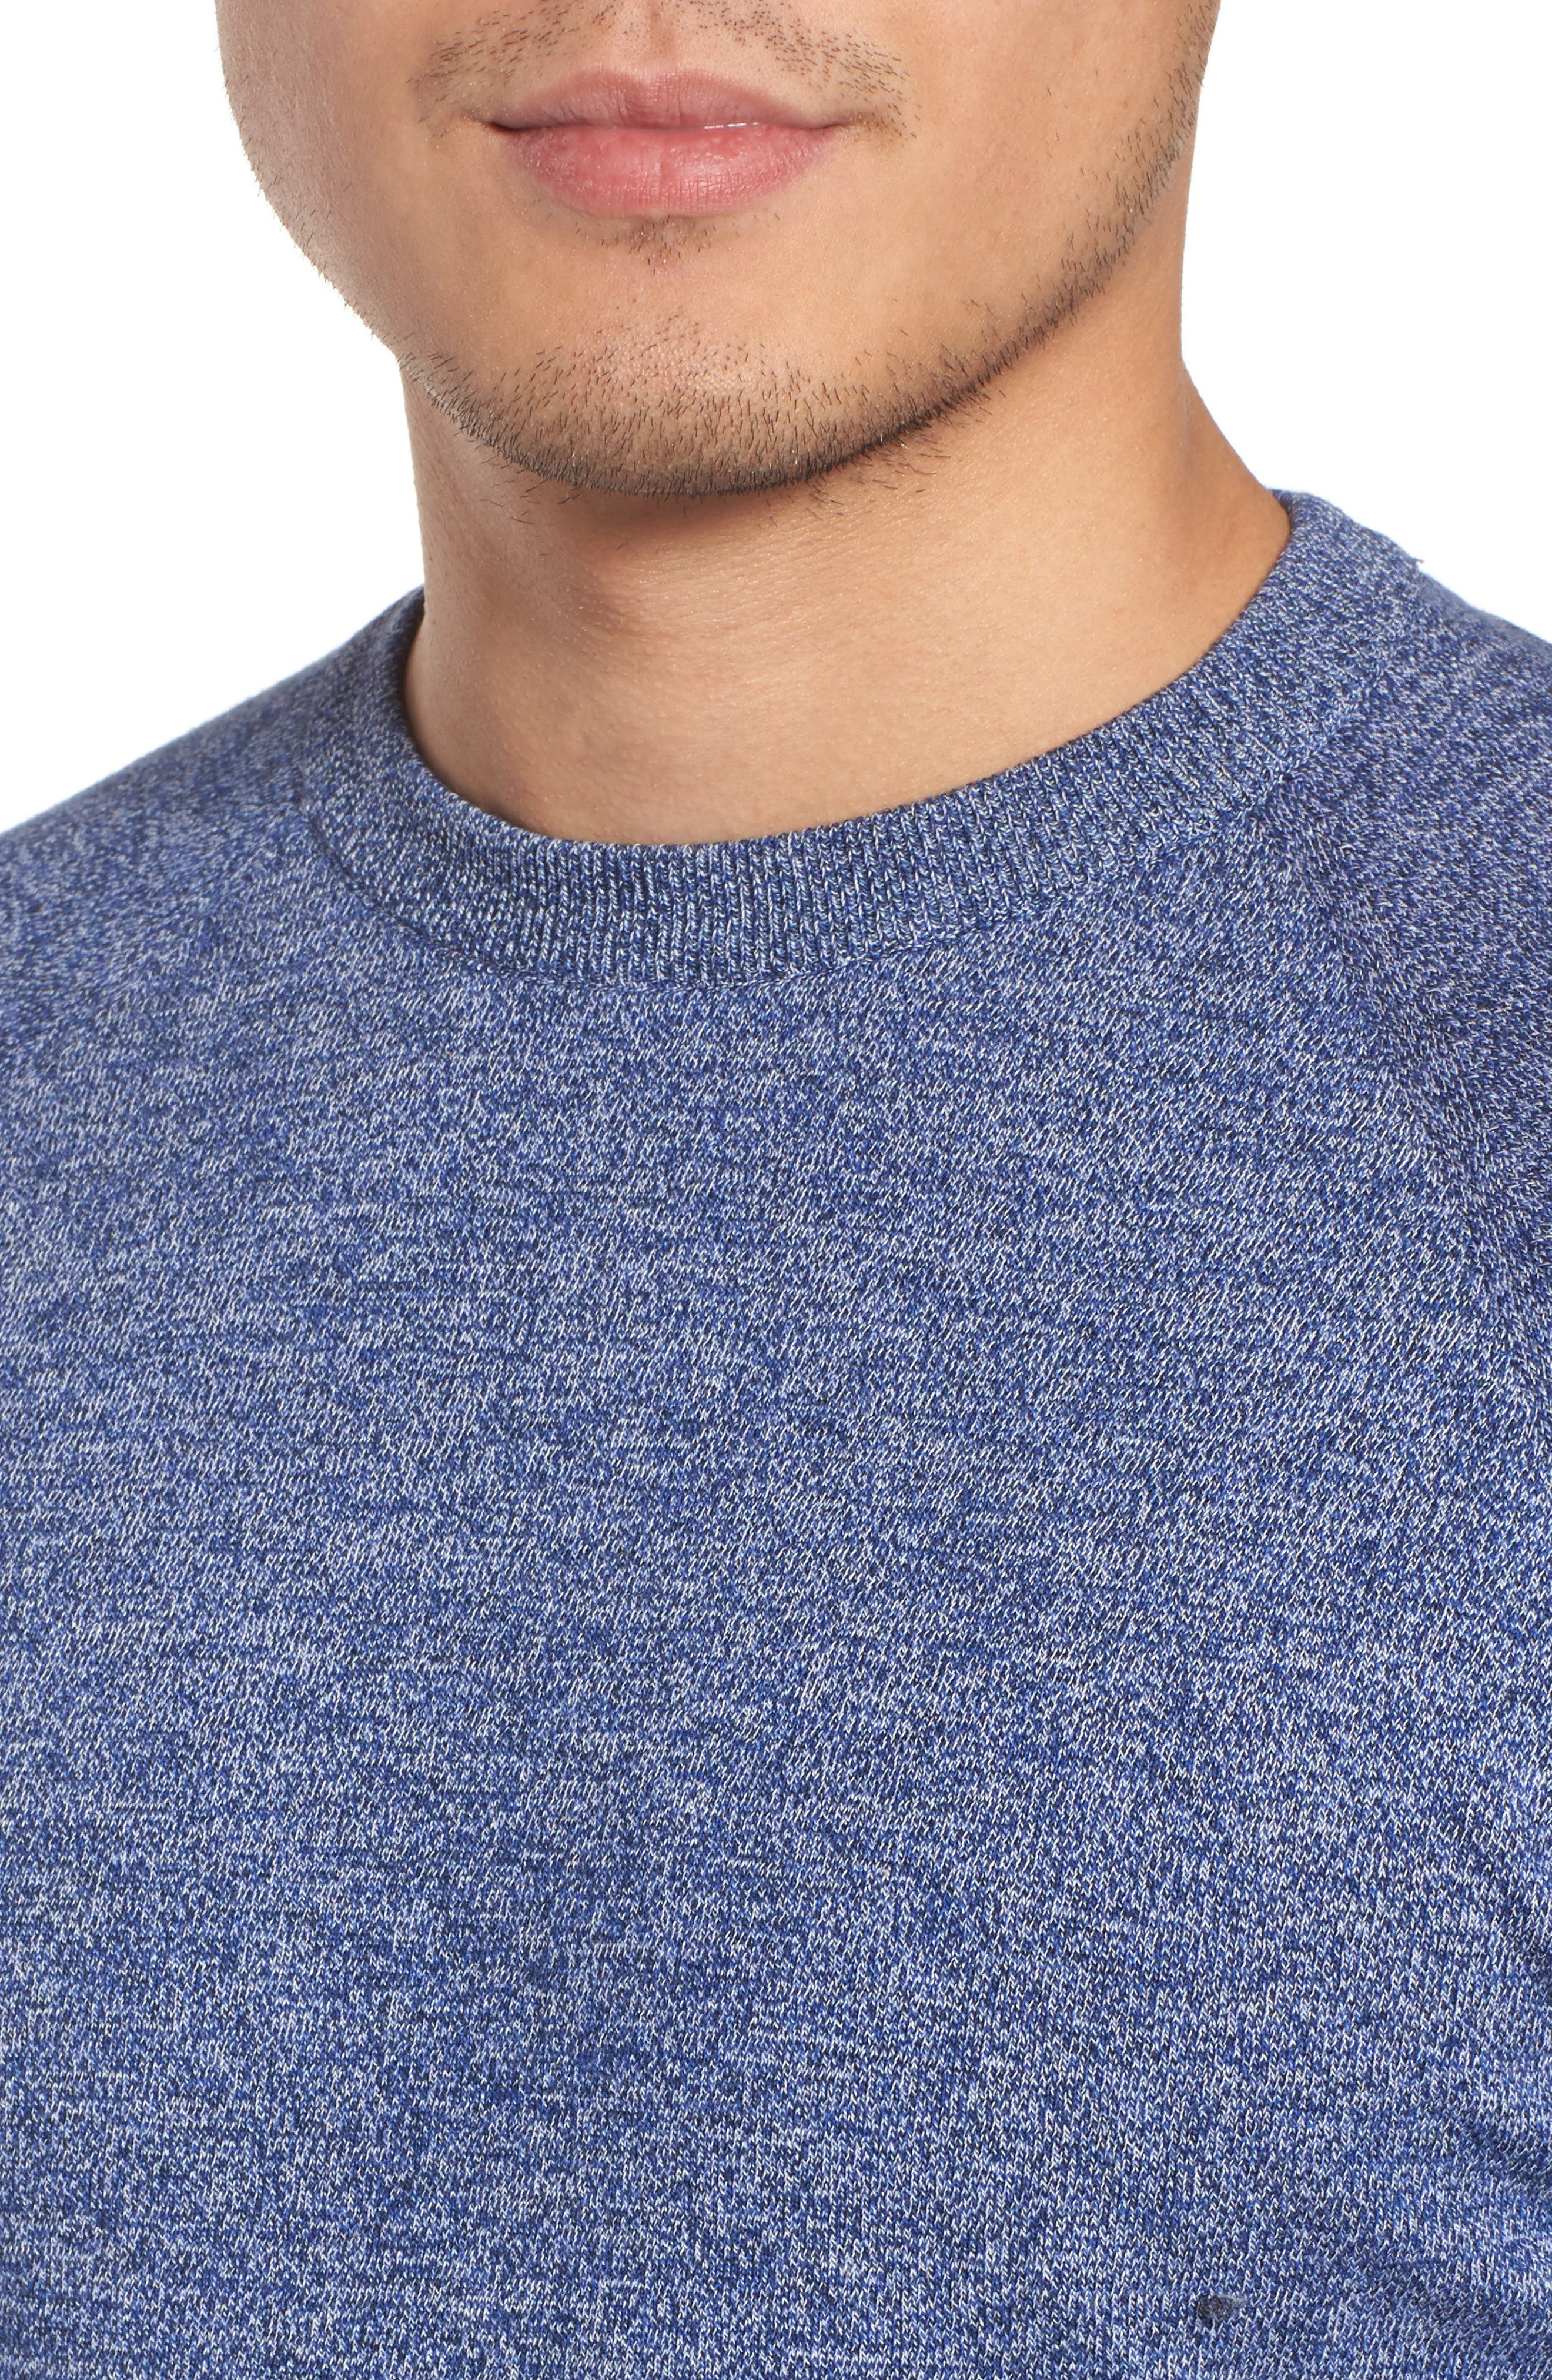 Space Dye Crewneck Shirt,                             Alternate thumbnail 4, color,                             450